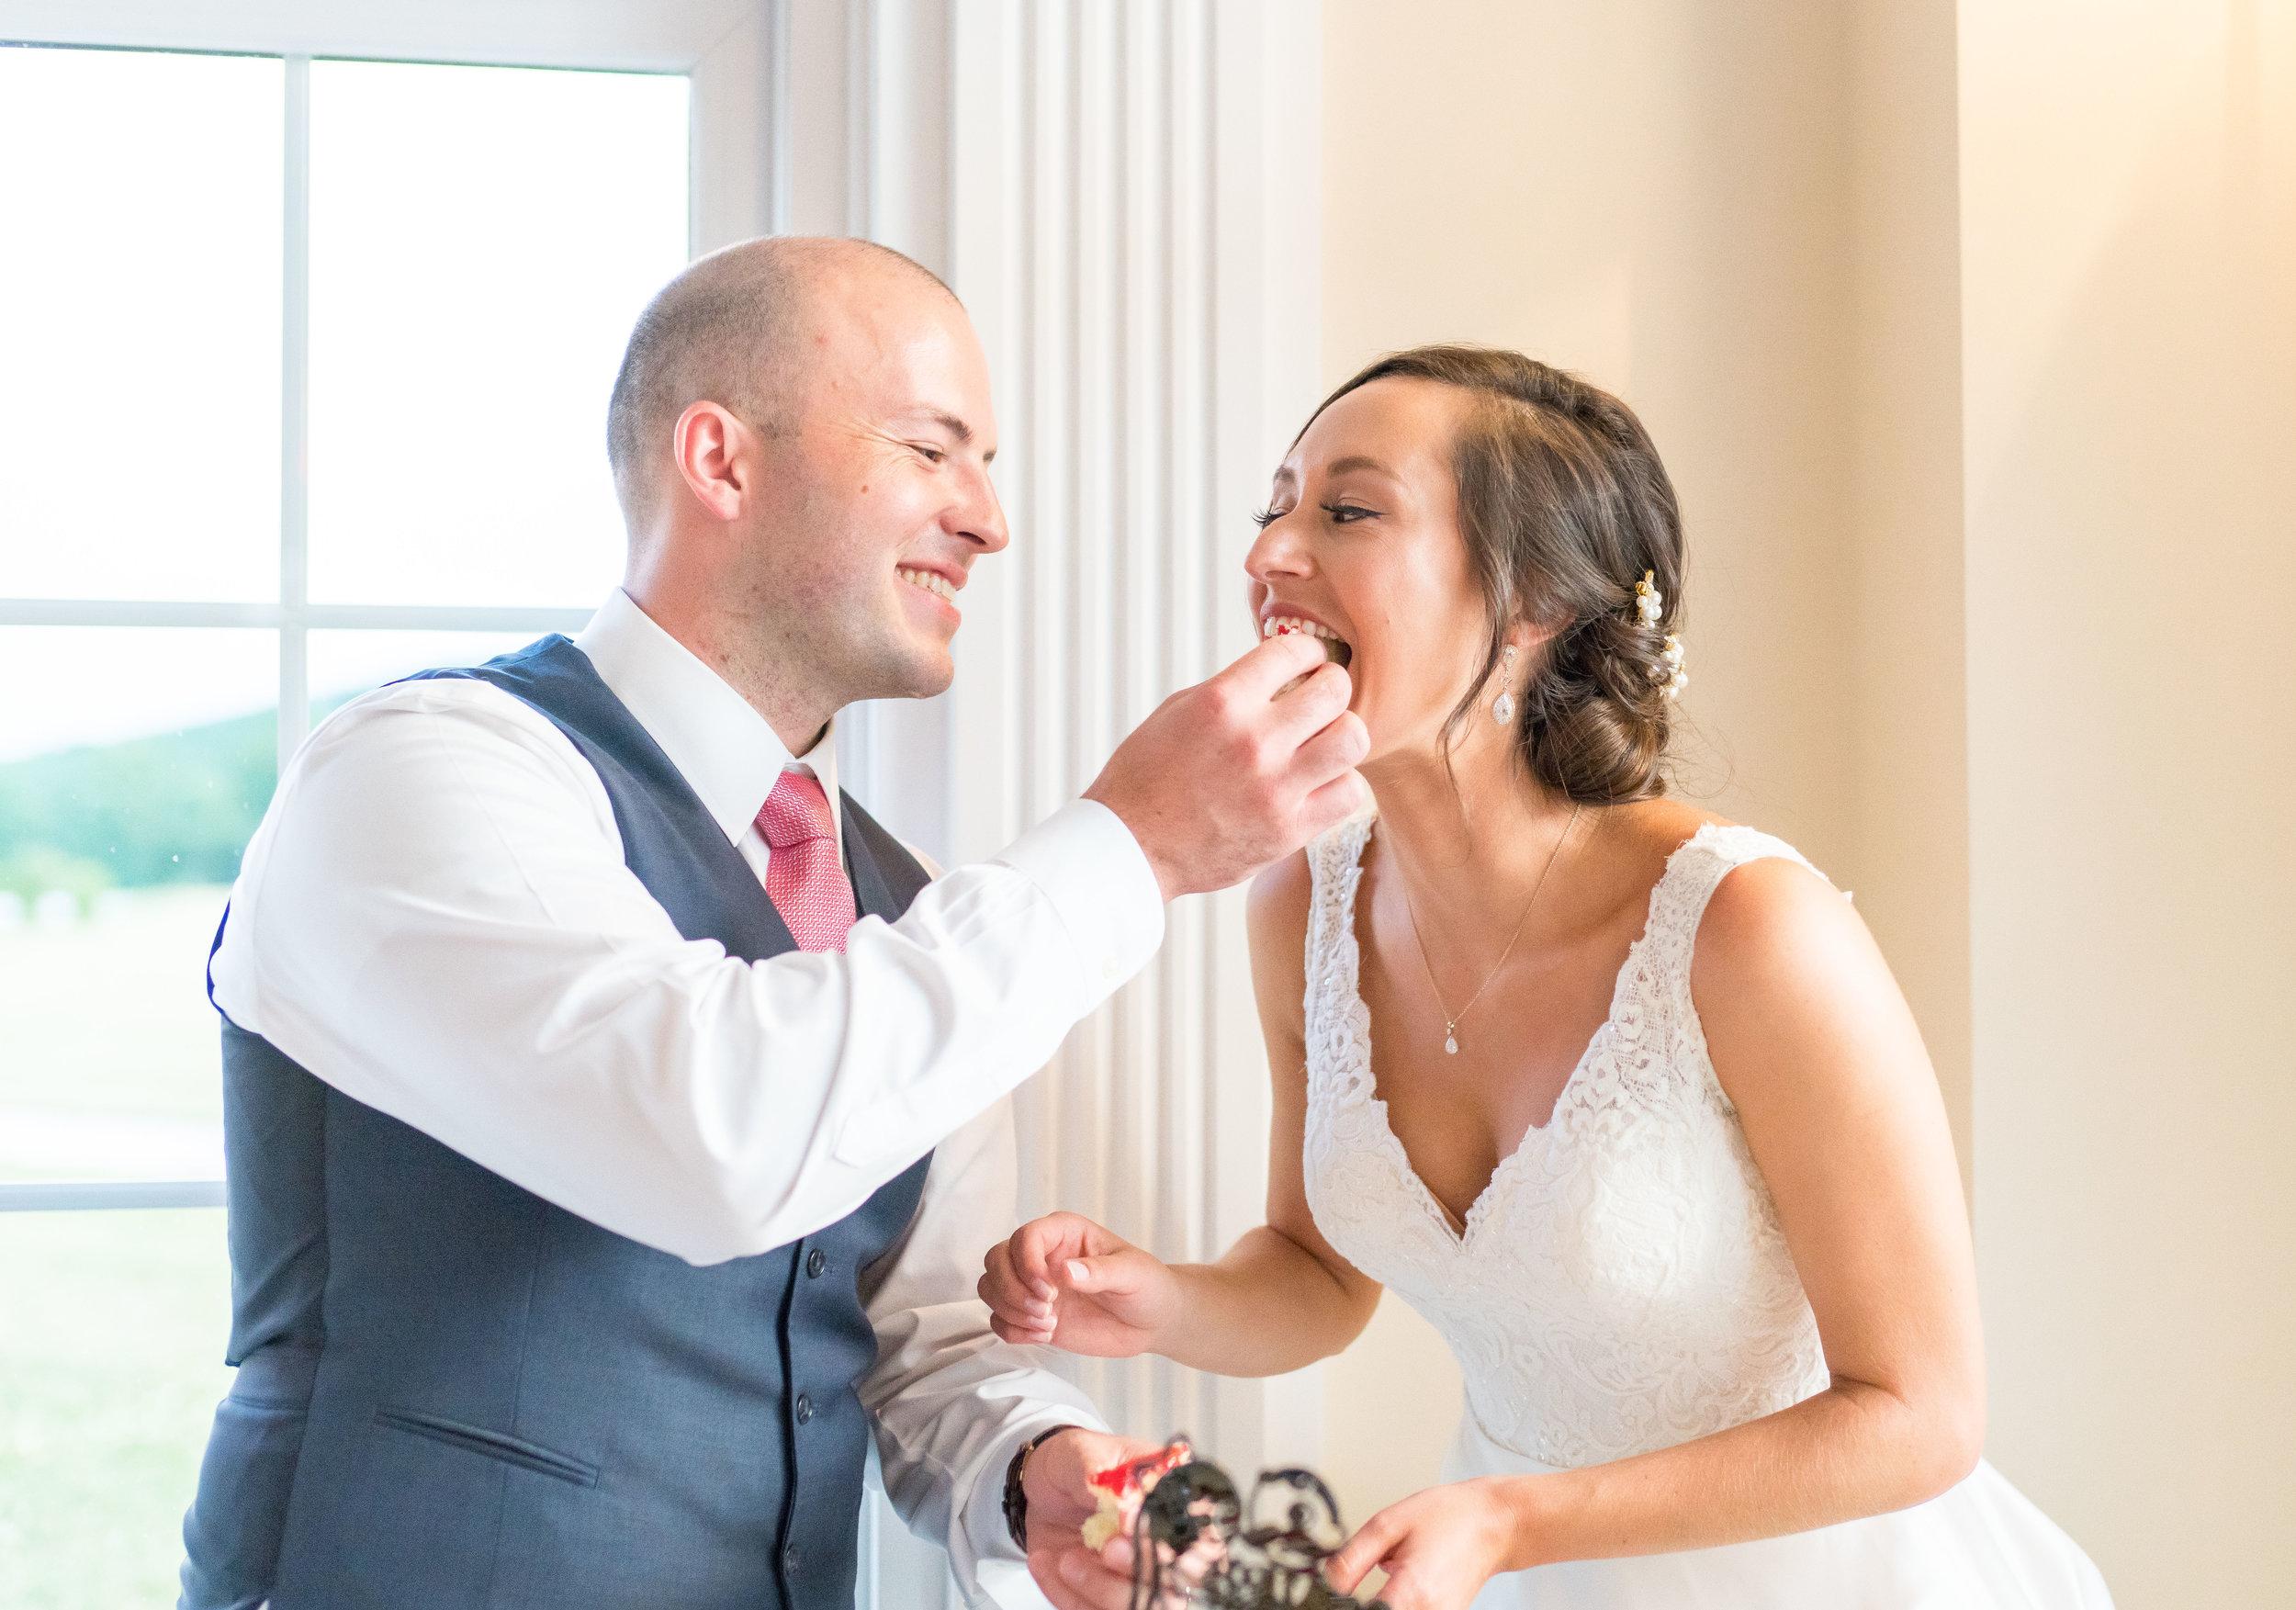 Bride and groom cutting cake in a beautiful ballroom